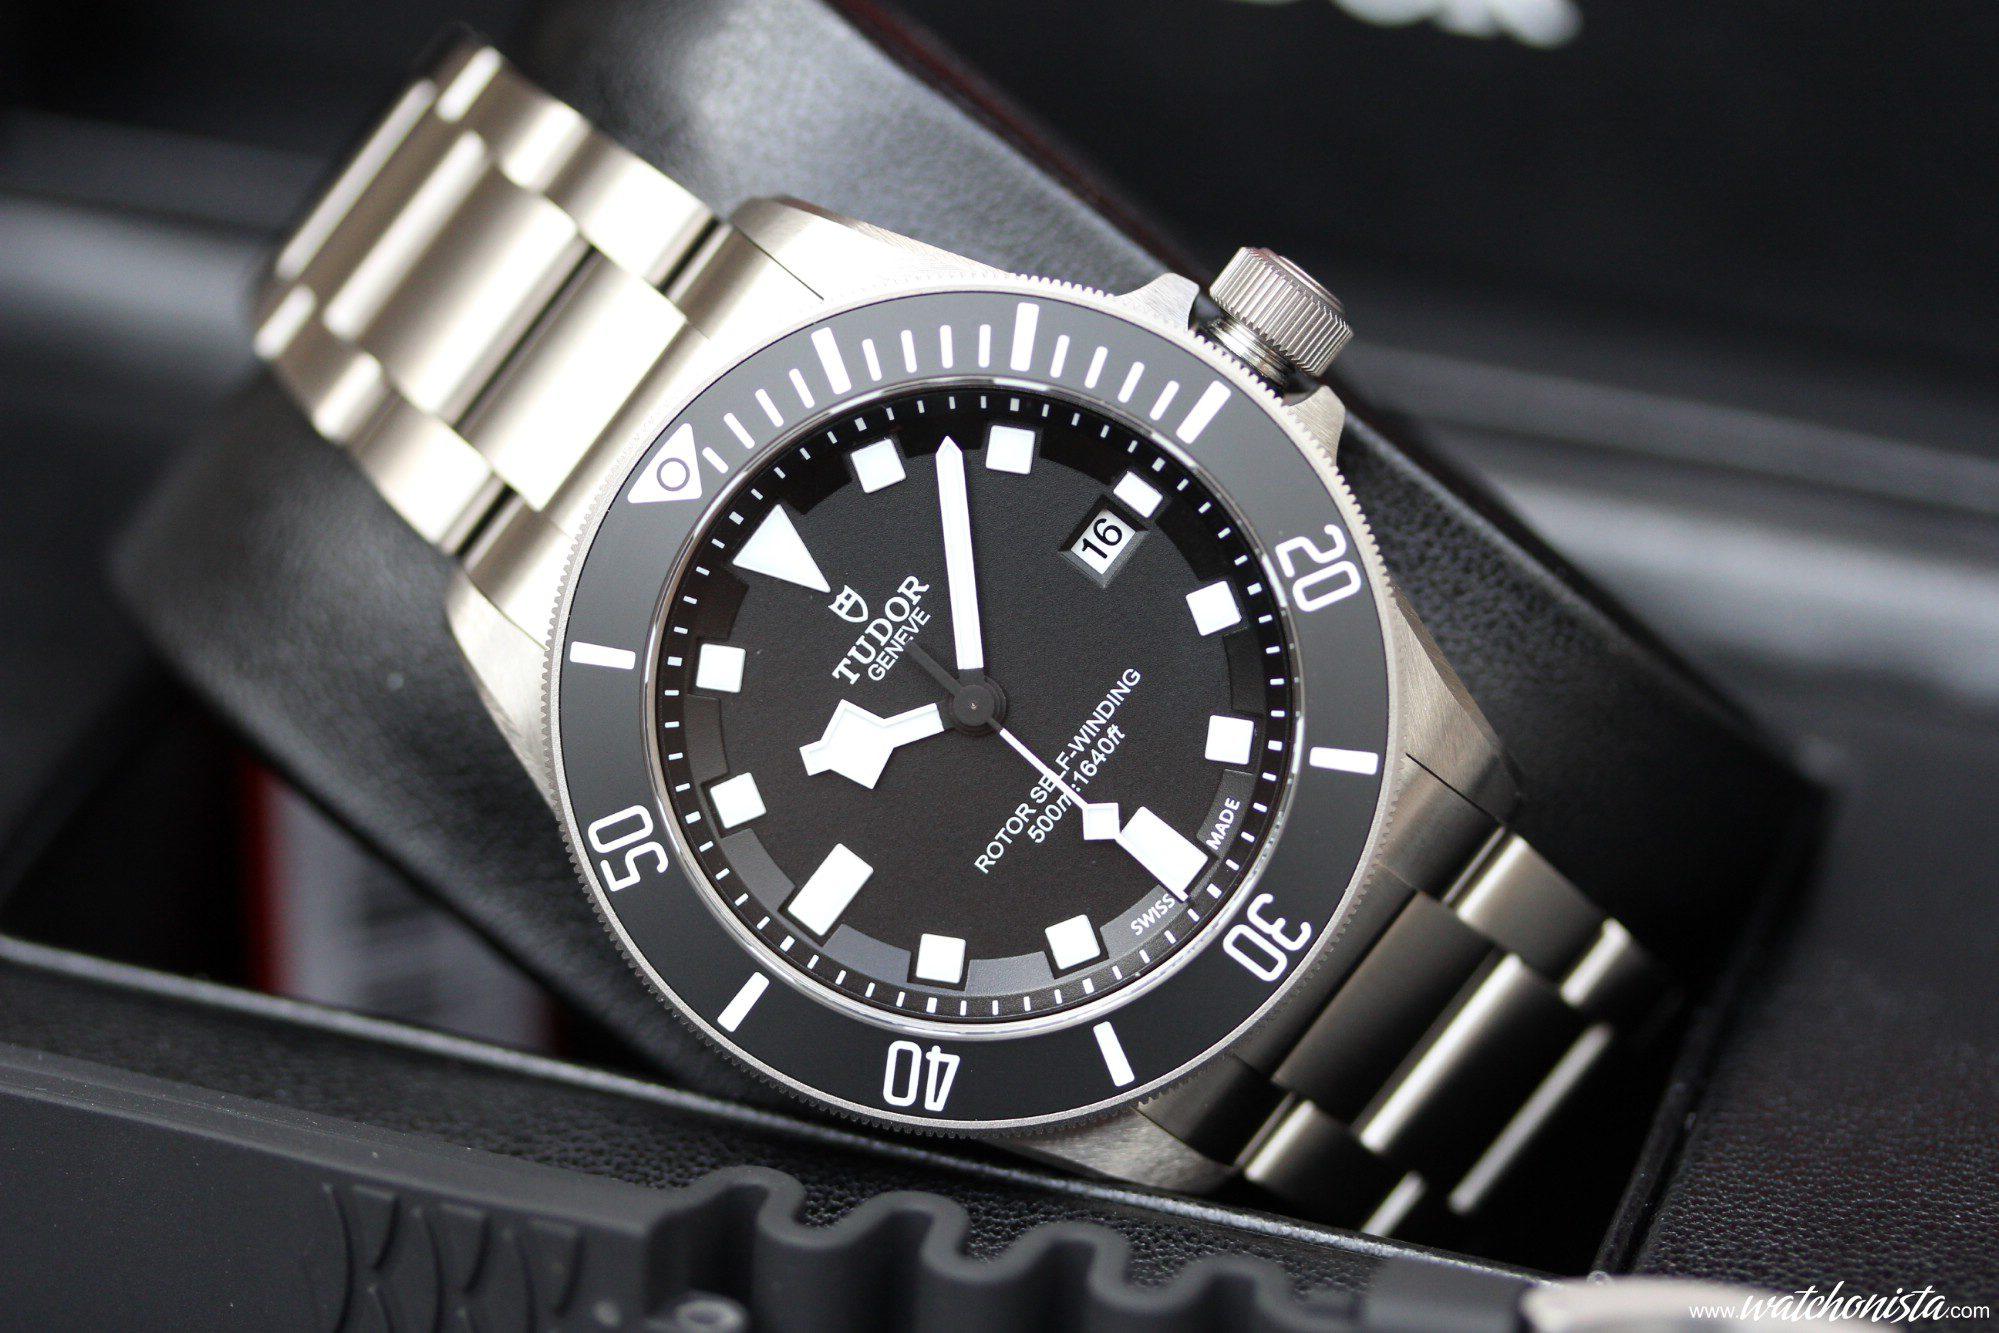 Tudor pelagos ultimate toolwatch reviews and articles - Tudor dive watch price ...